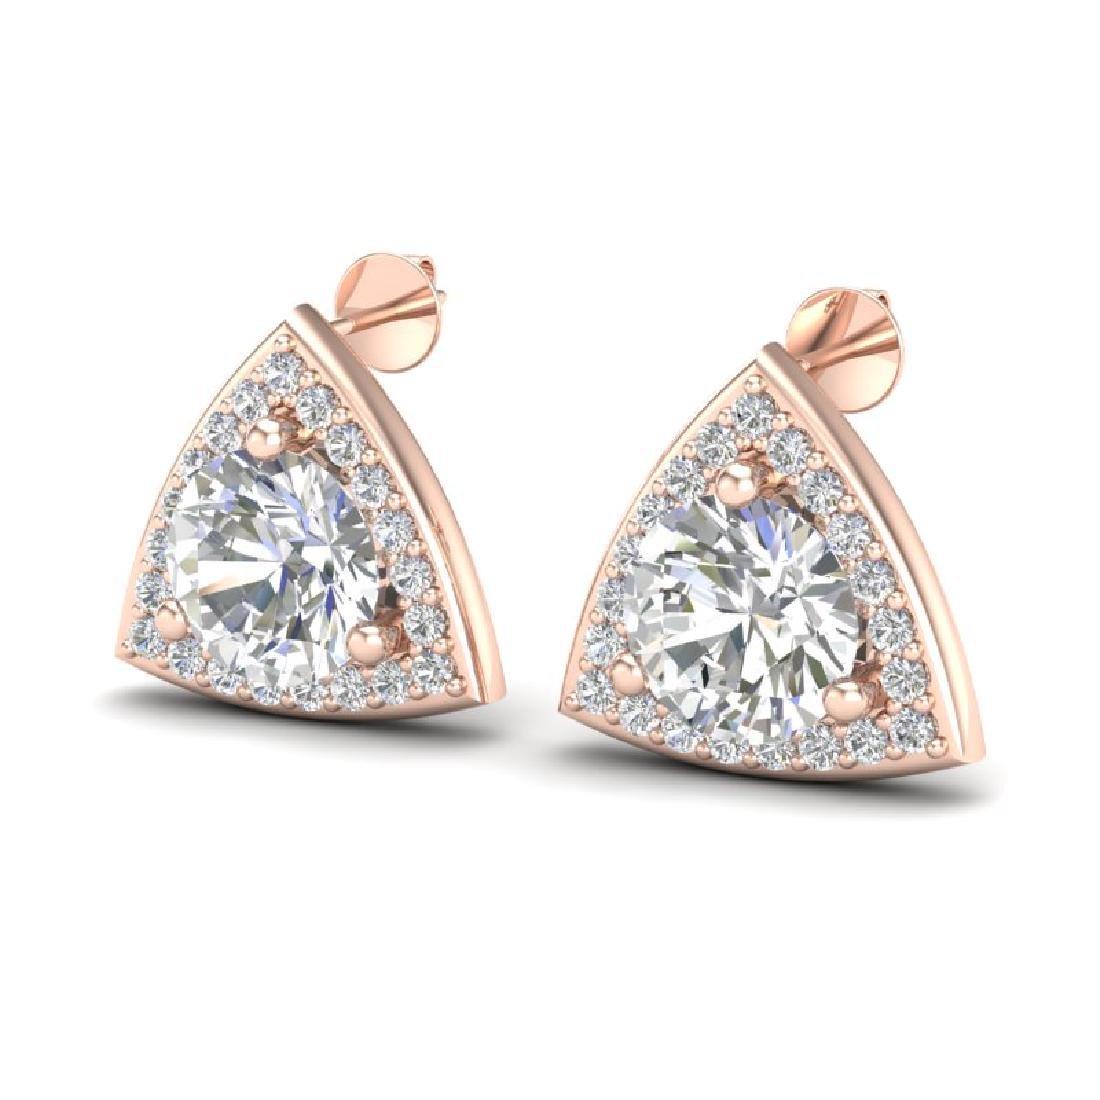 3 CTW VS/SI Diamond Stud Earrings 14K Rose Gold